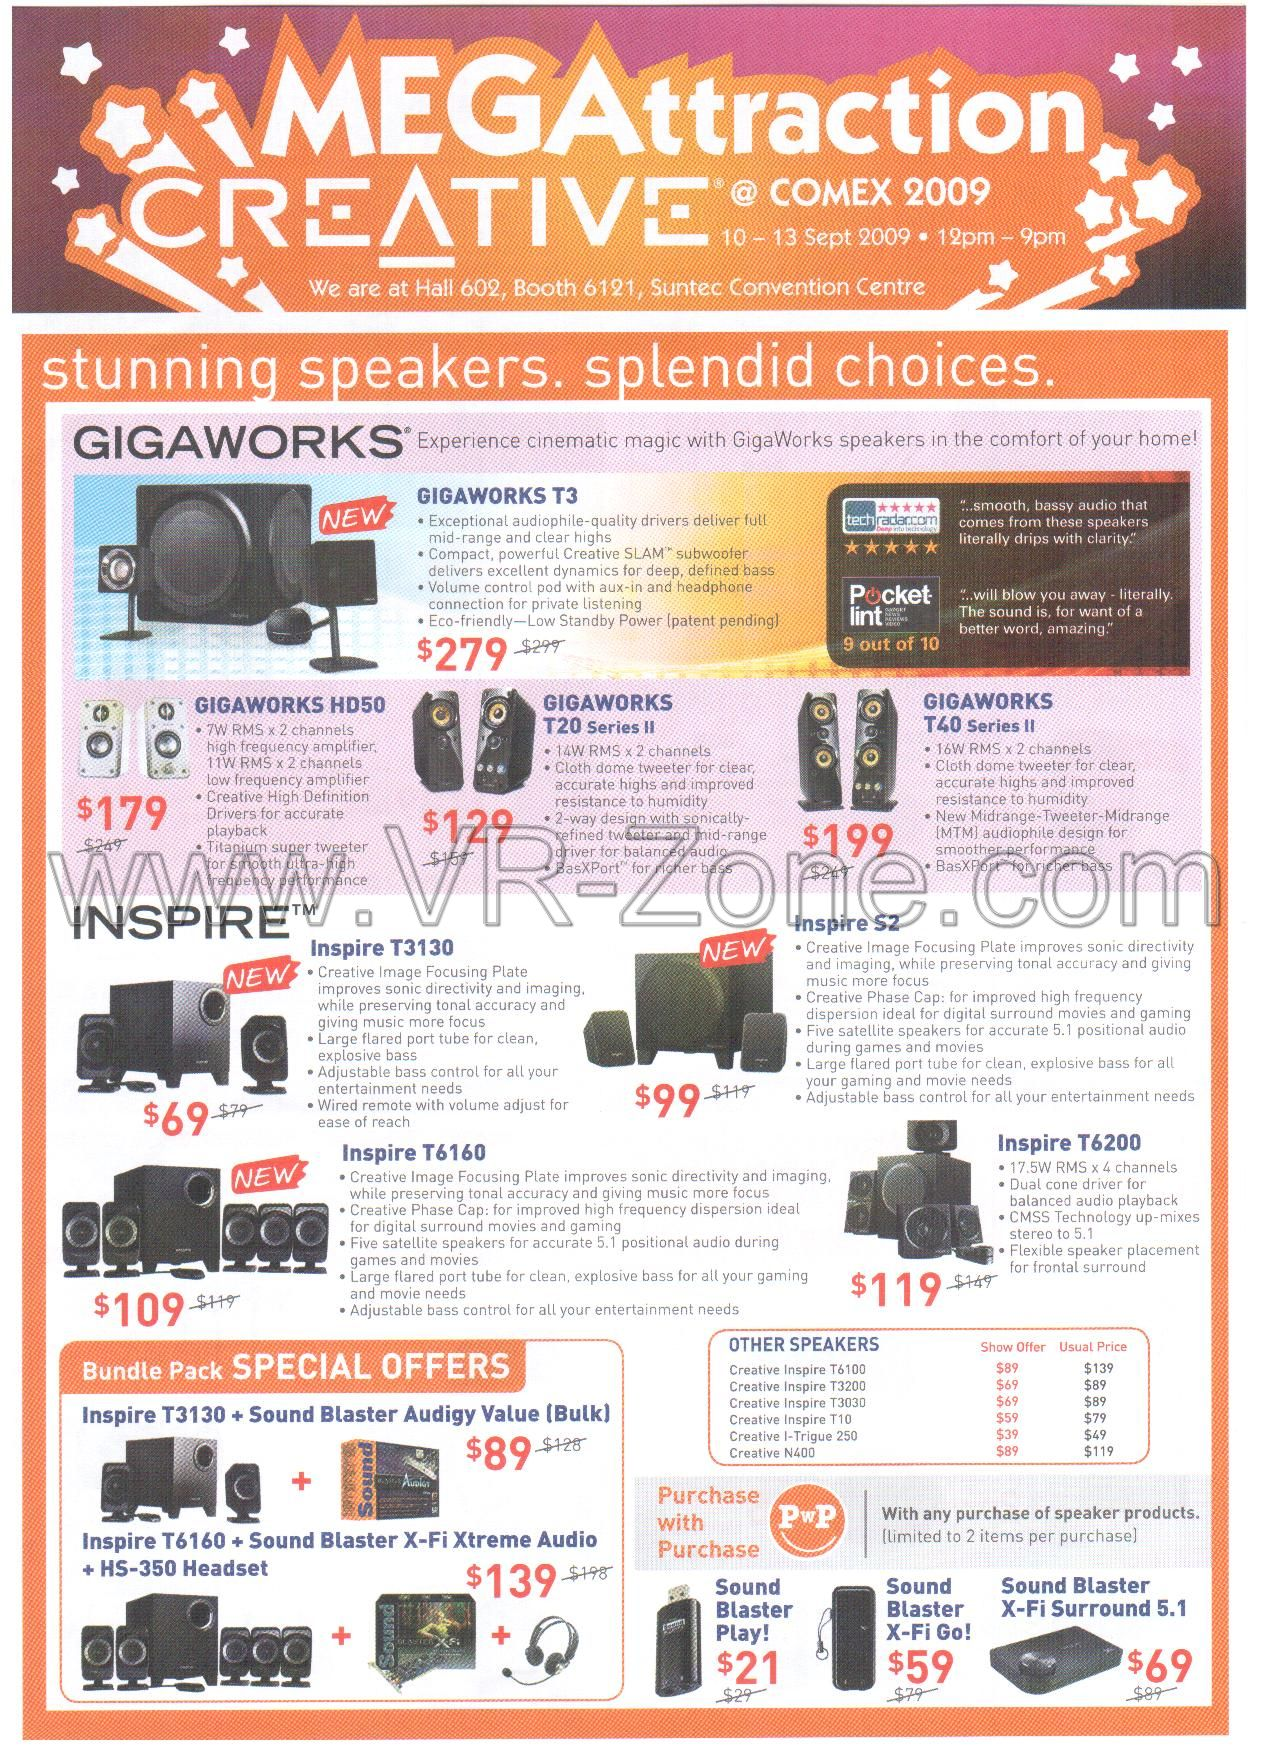 Comex 2009 price list image brochure of Creative Speakers Gigaworks Inspire X-Fi